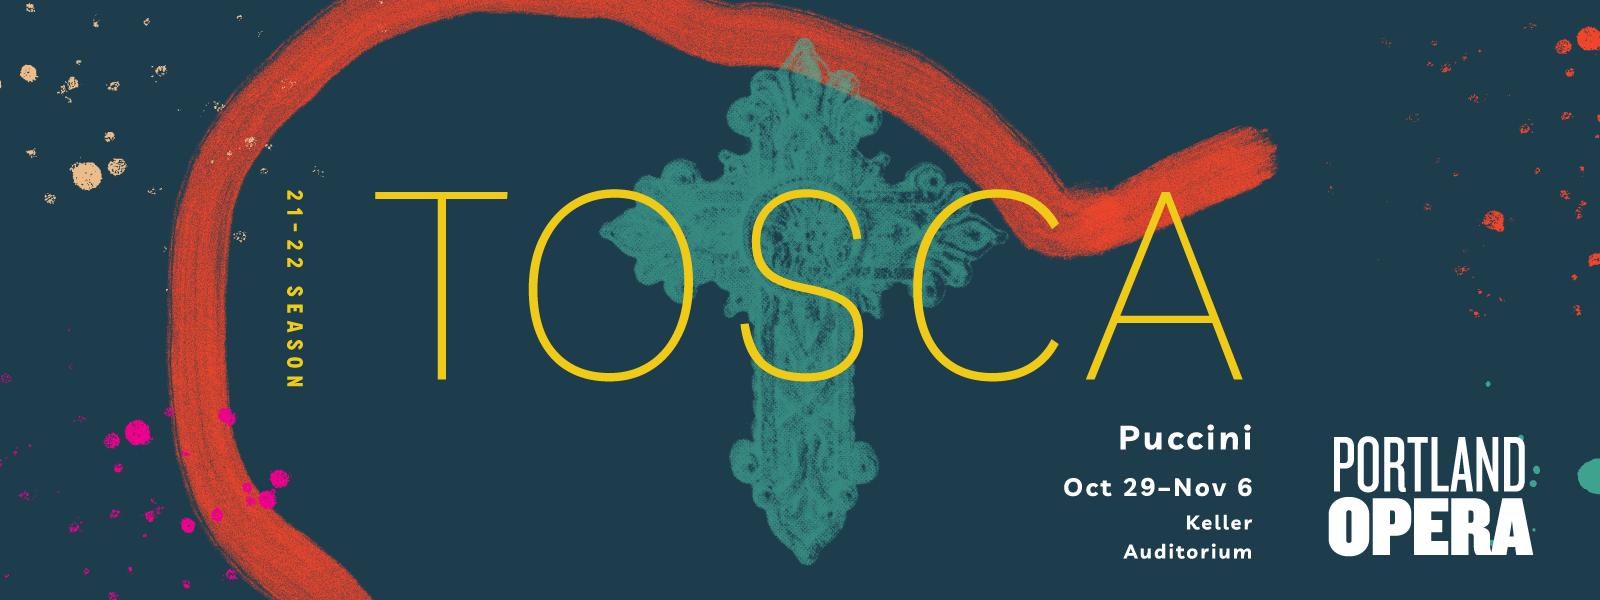 Portland Opera Banner - Tosca